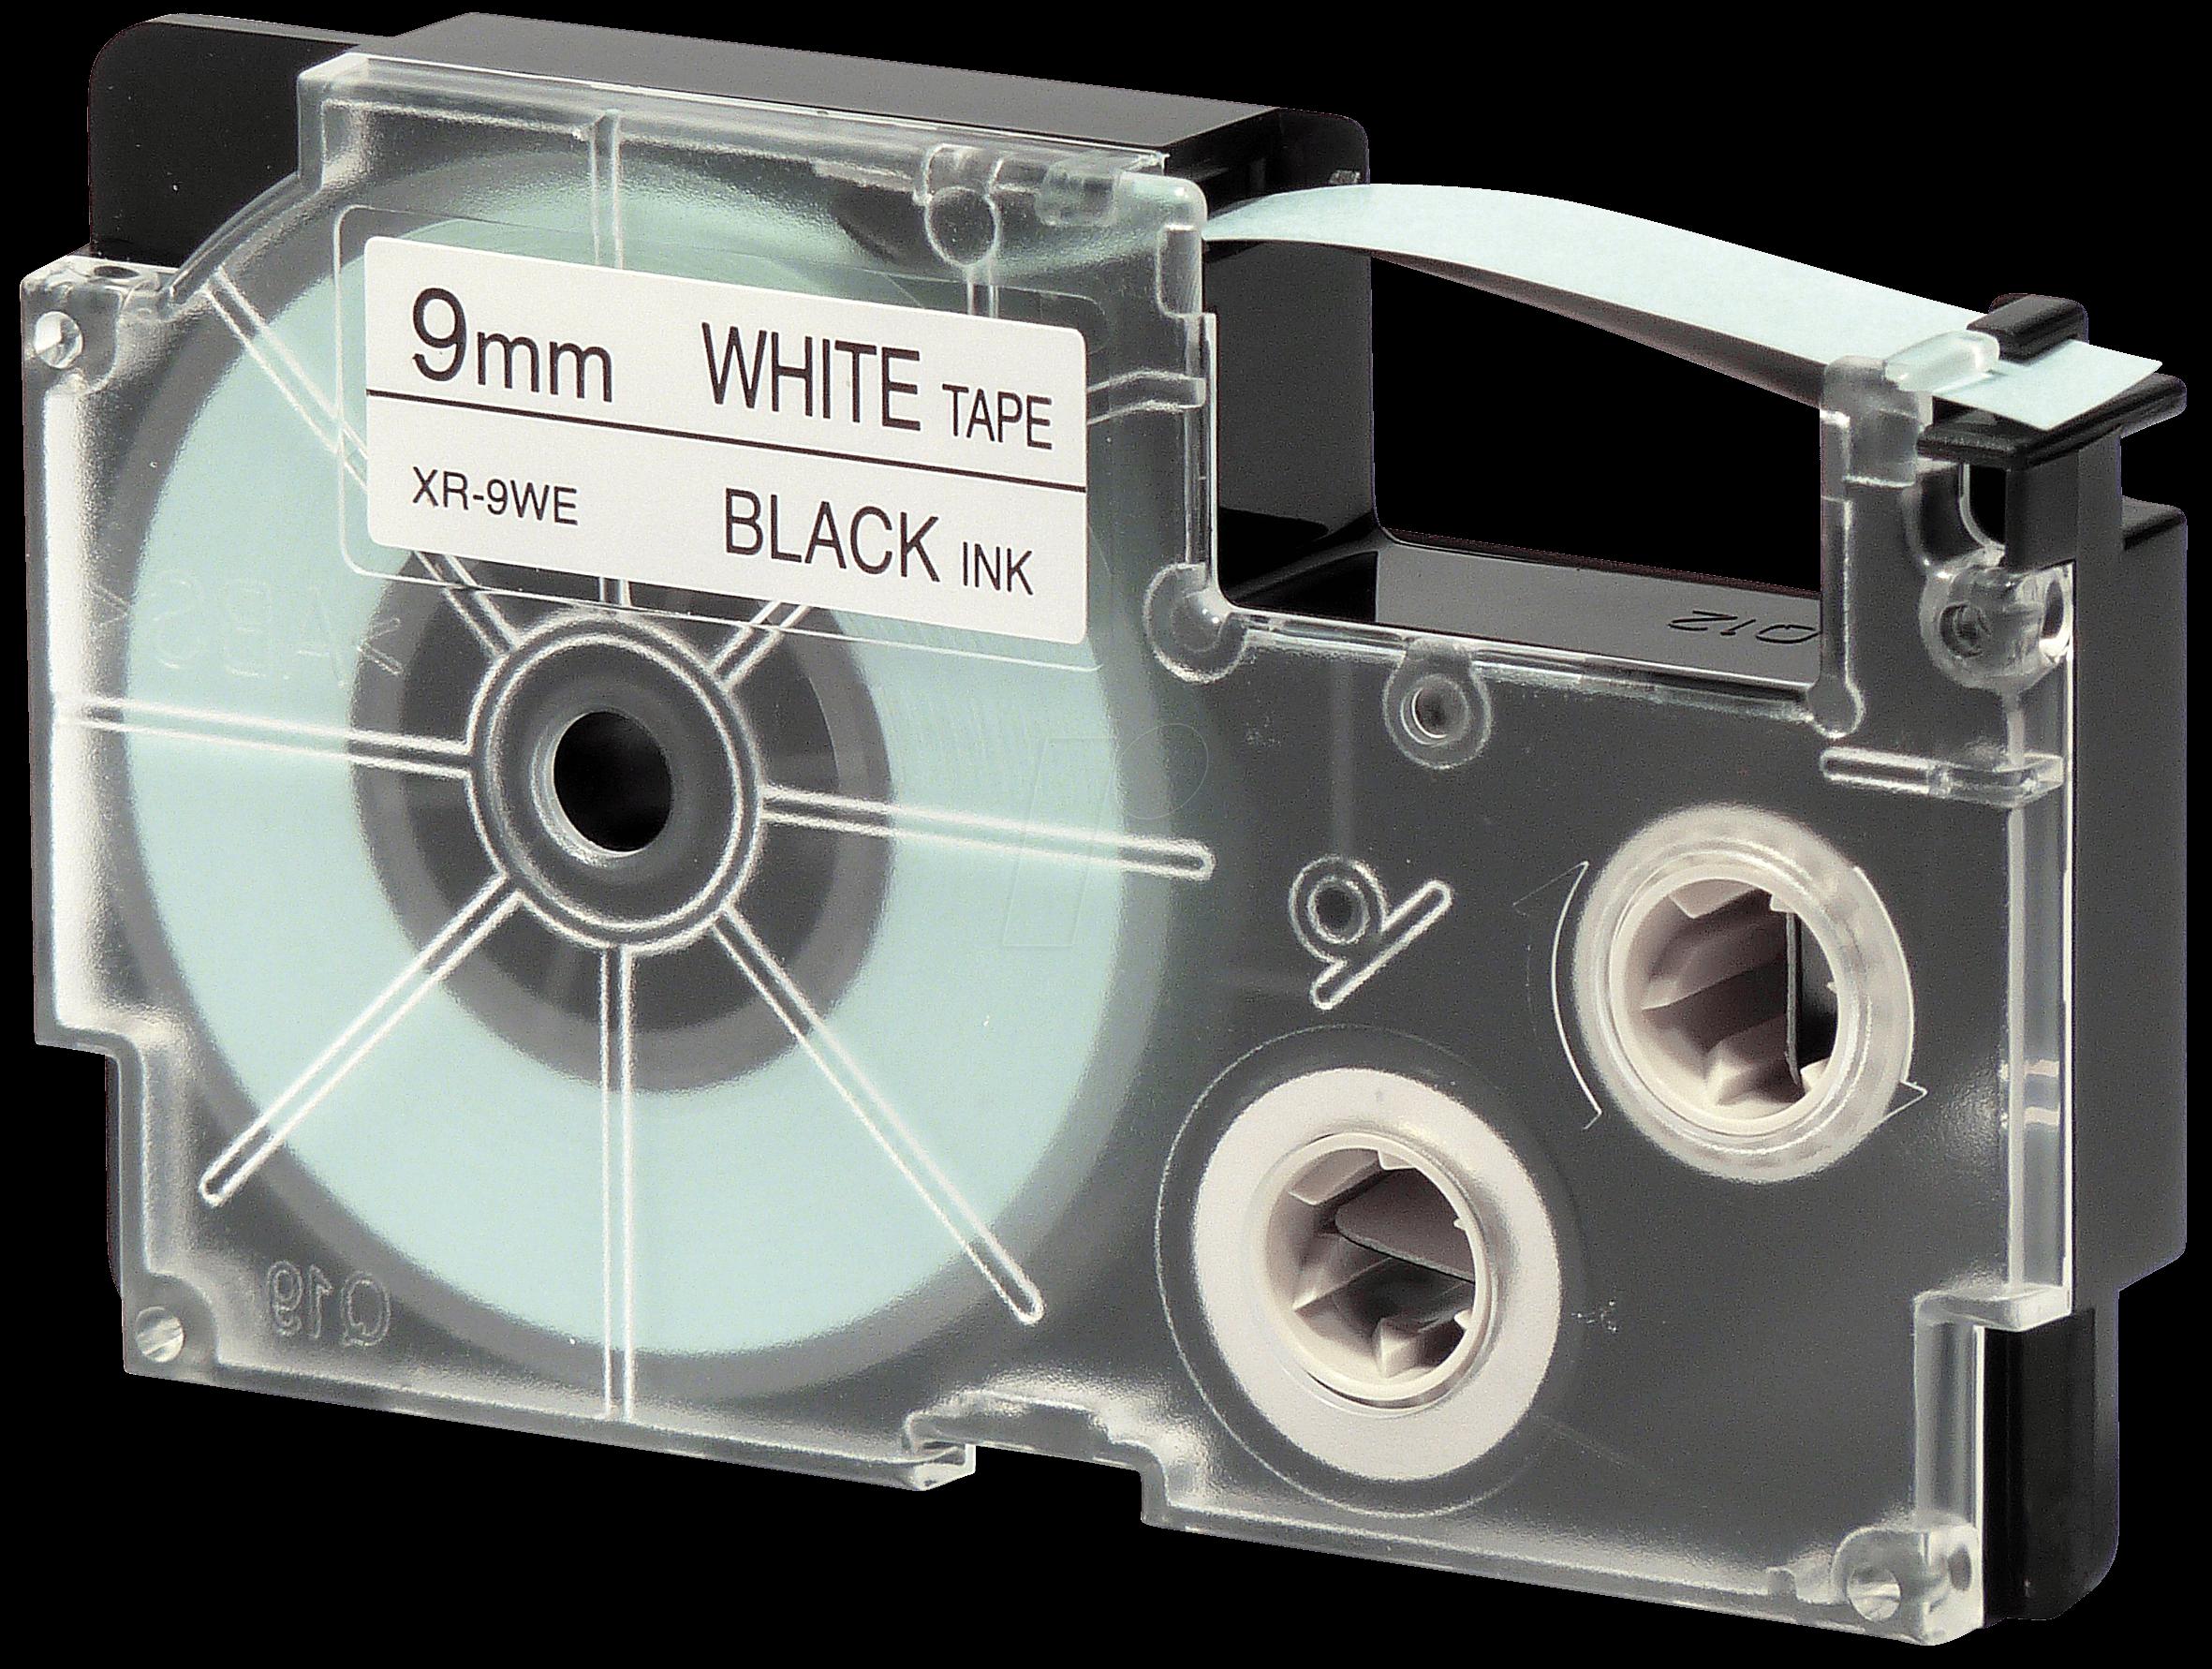 https://cdn-reichelt.de/bilder/web/xxl_ws/F100/CAS_XR-9WE1WHITE_BLACK.png